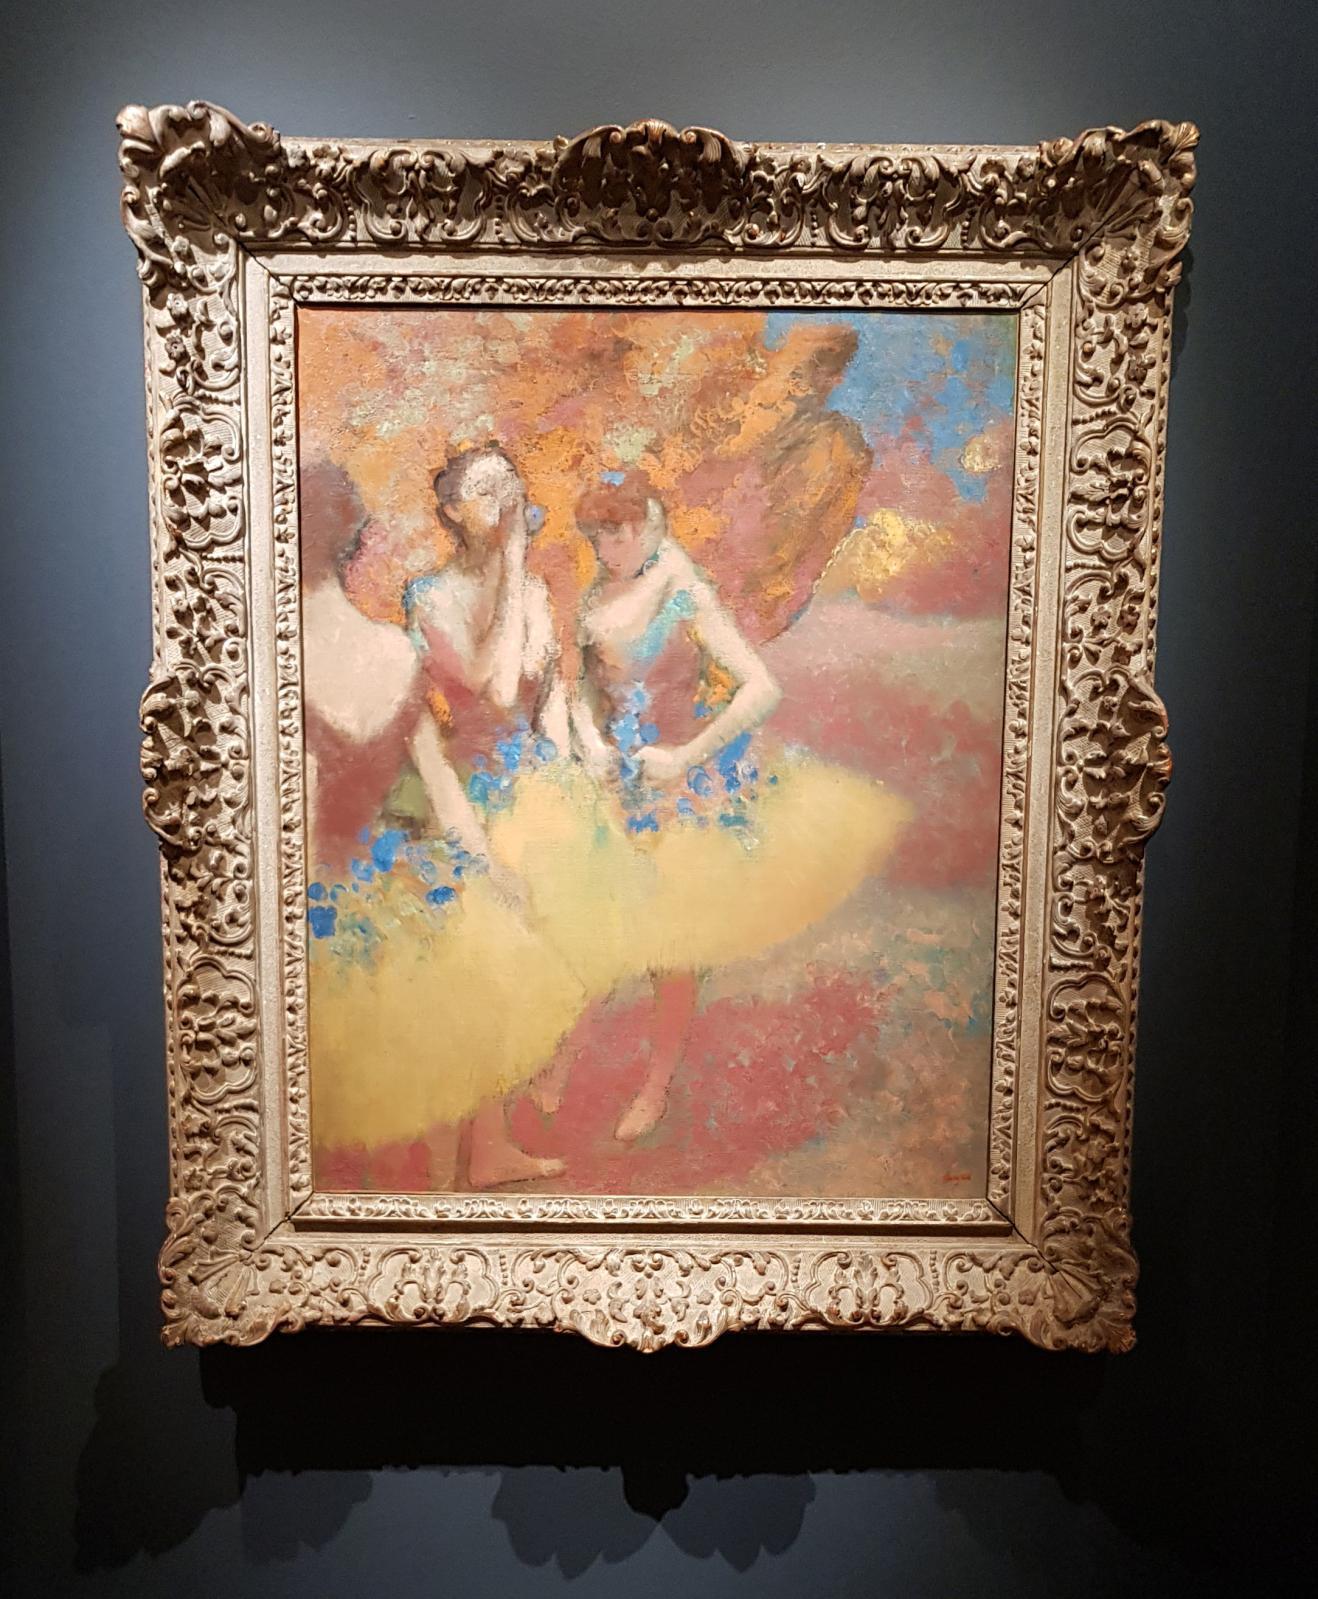 Edgar Degas, Trois danseuses en jupes jaunes, vers 1891, huile sur toile.© Hammer Galleries et Tefaf